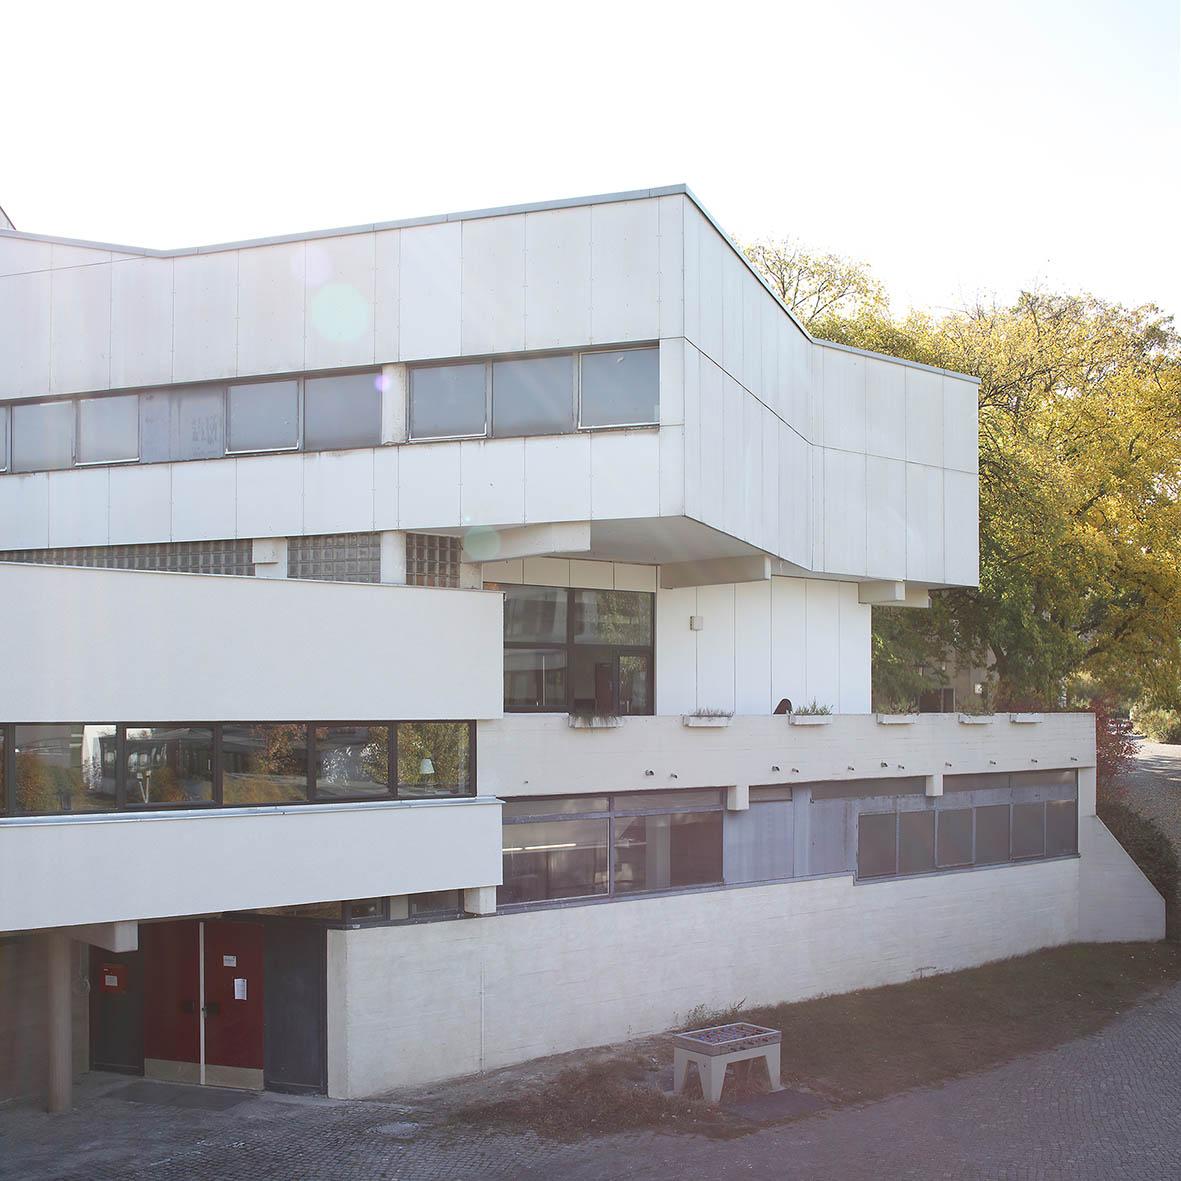 Revitalising Haus 14 – Interview with Christa Markl-Vieto